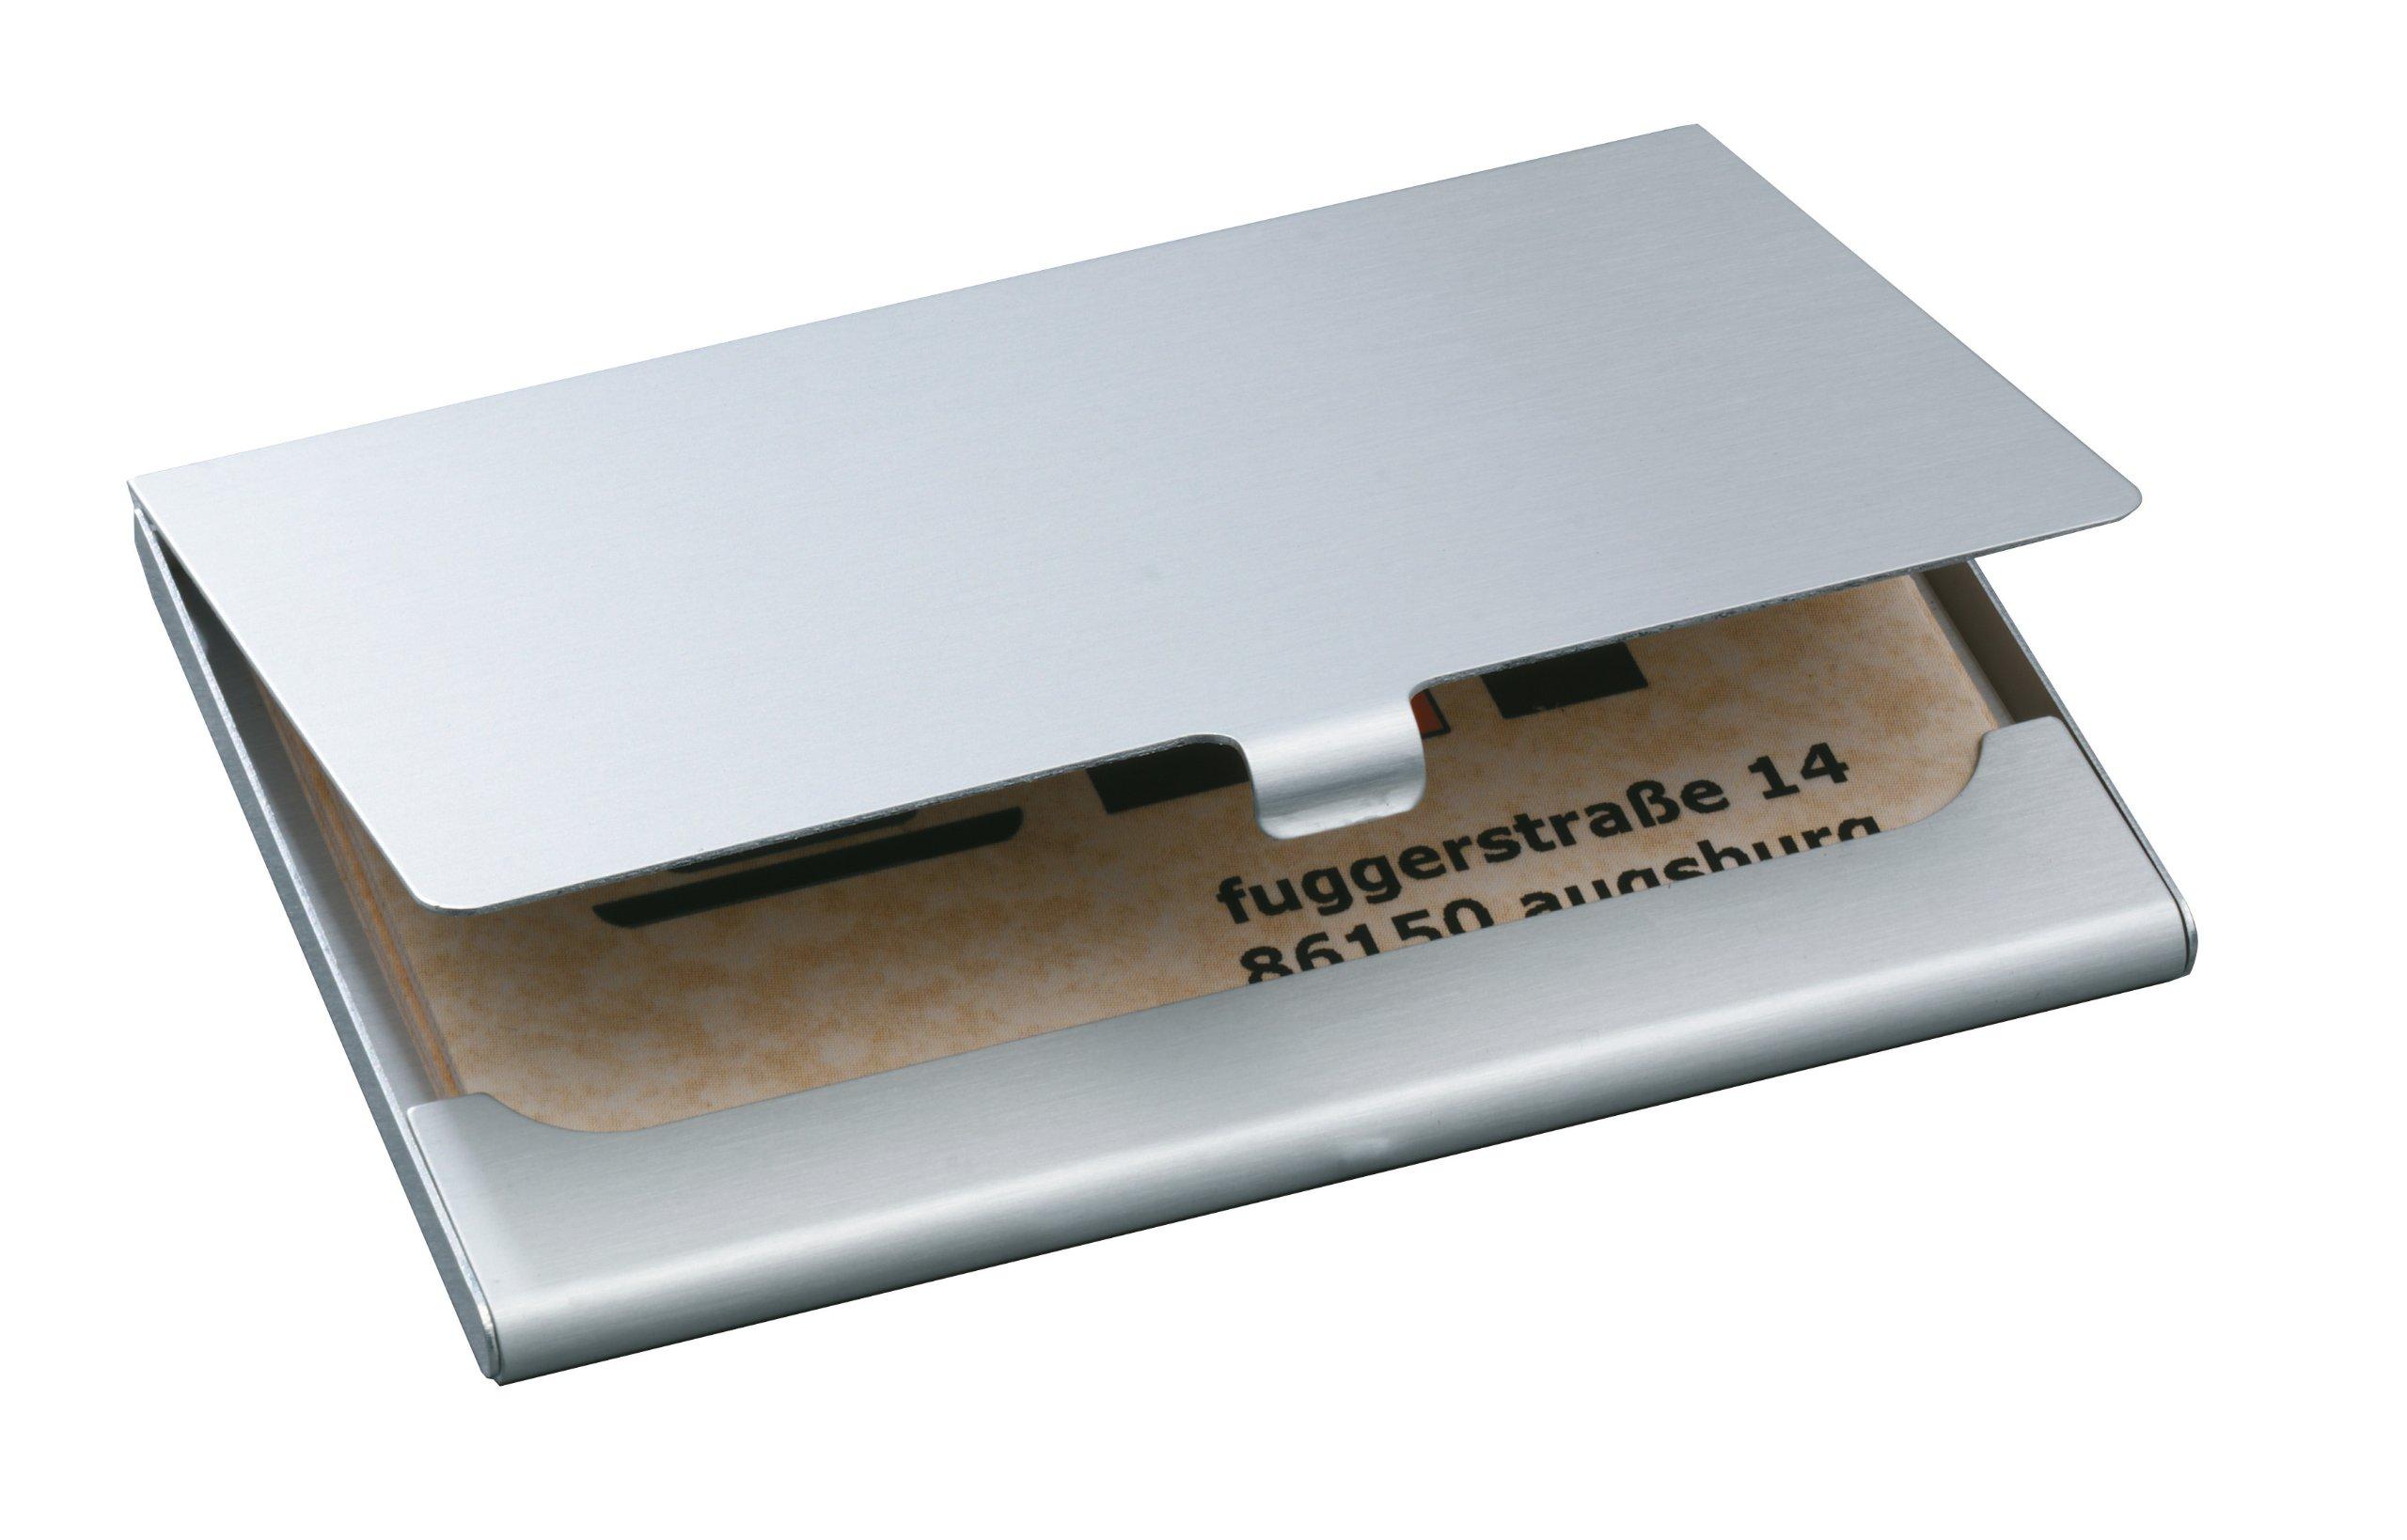 SIGEL VZ135 Tarjetero/Estuche para tarjetas de visita, aluminio para 15 tarjetas: Amazon.es: Hogar